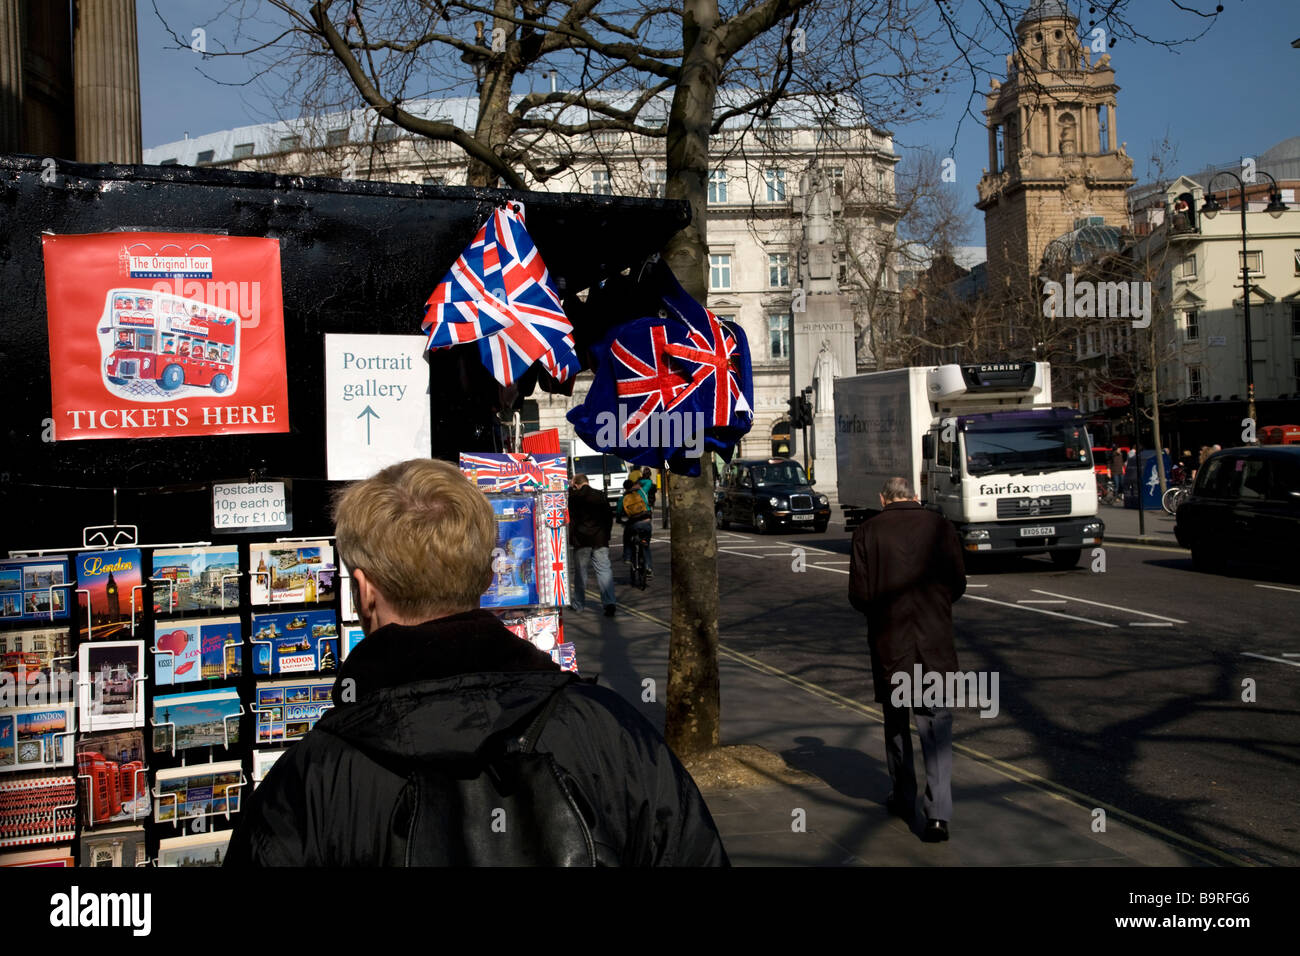 Man looking at postcards Charing Cross Road London England - Stock Image